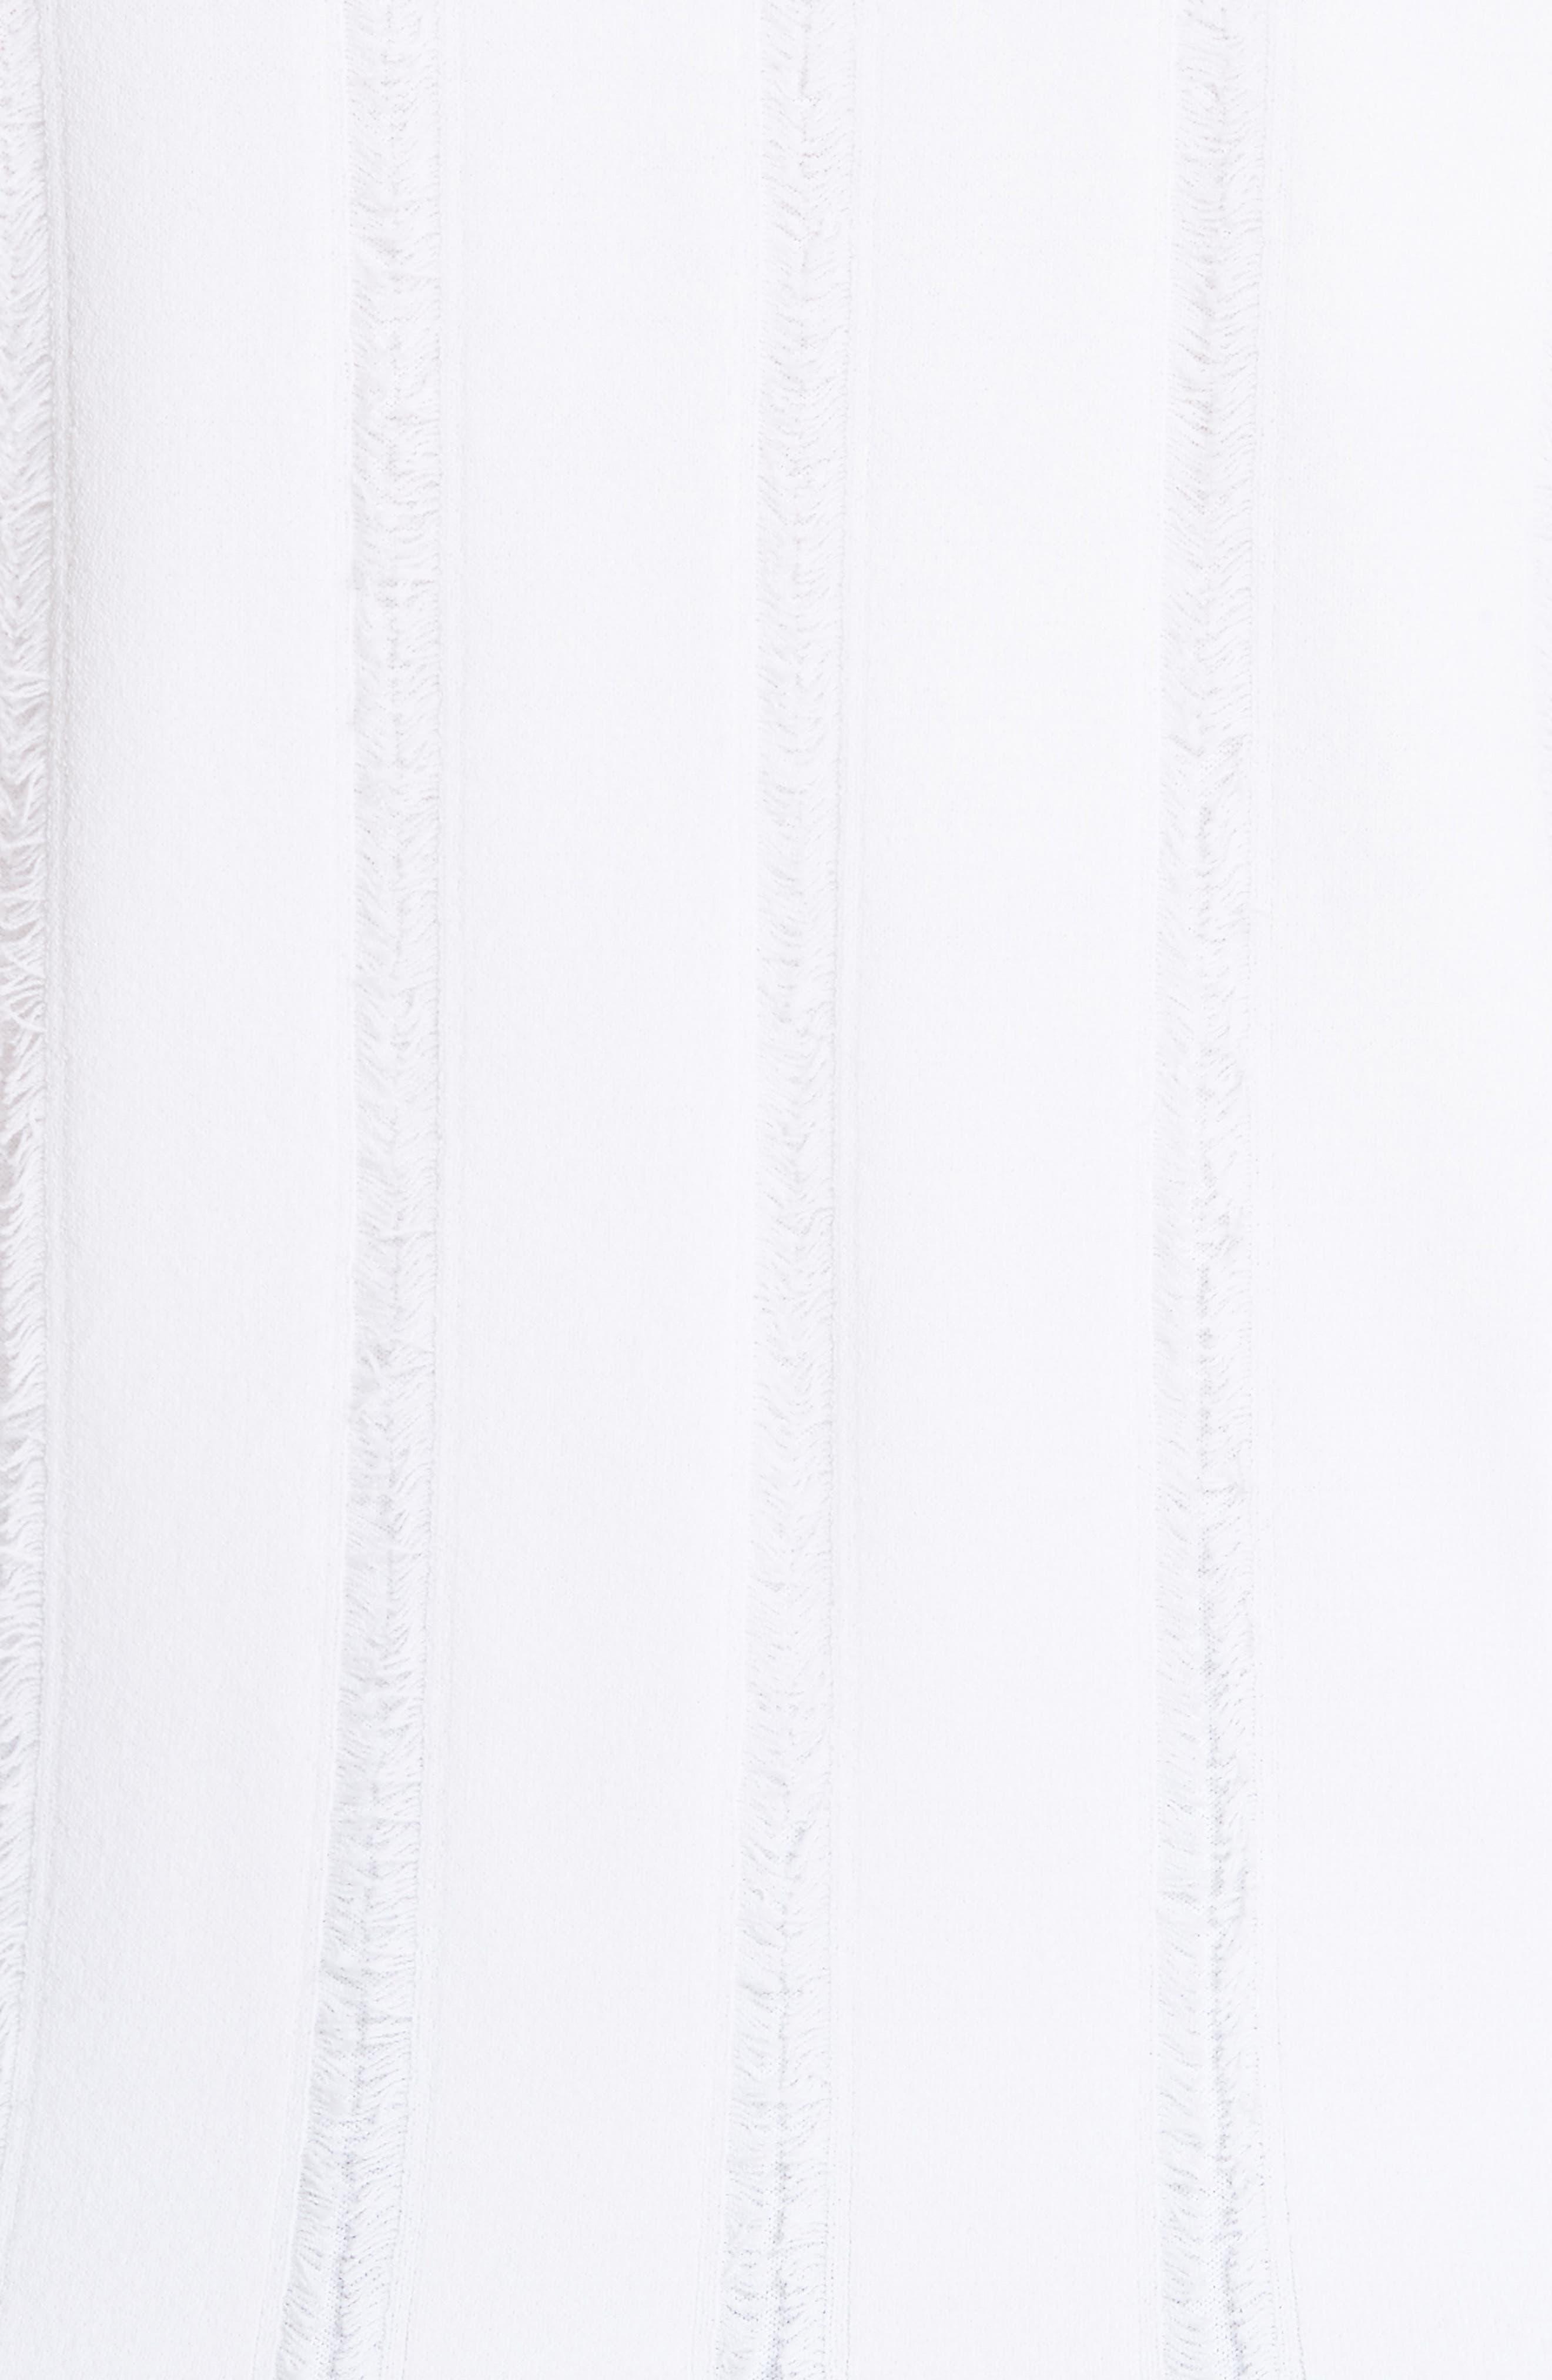 Cirrus Fringe Shell,                             Alternate thumbnail 5, color,                             White/ White